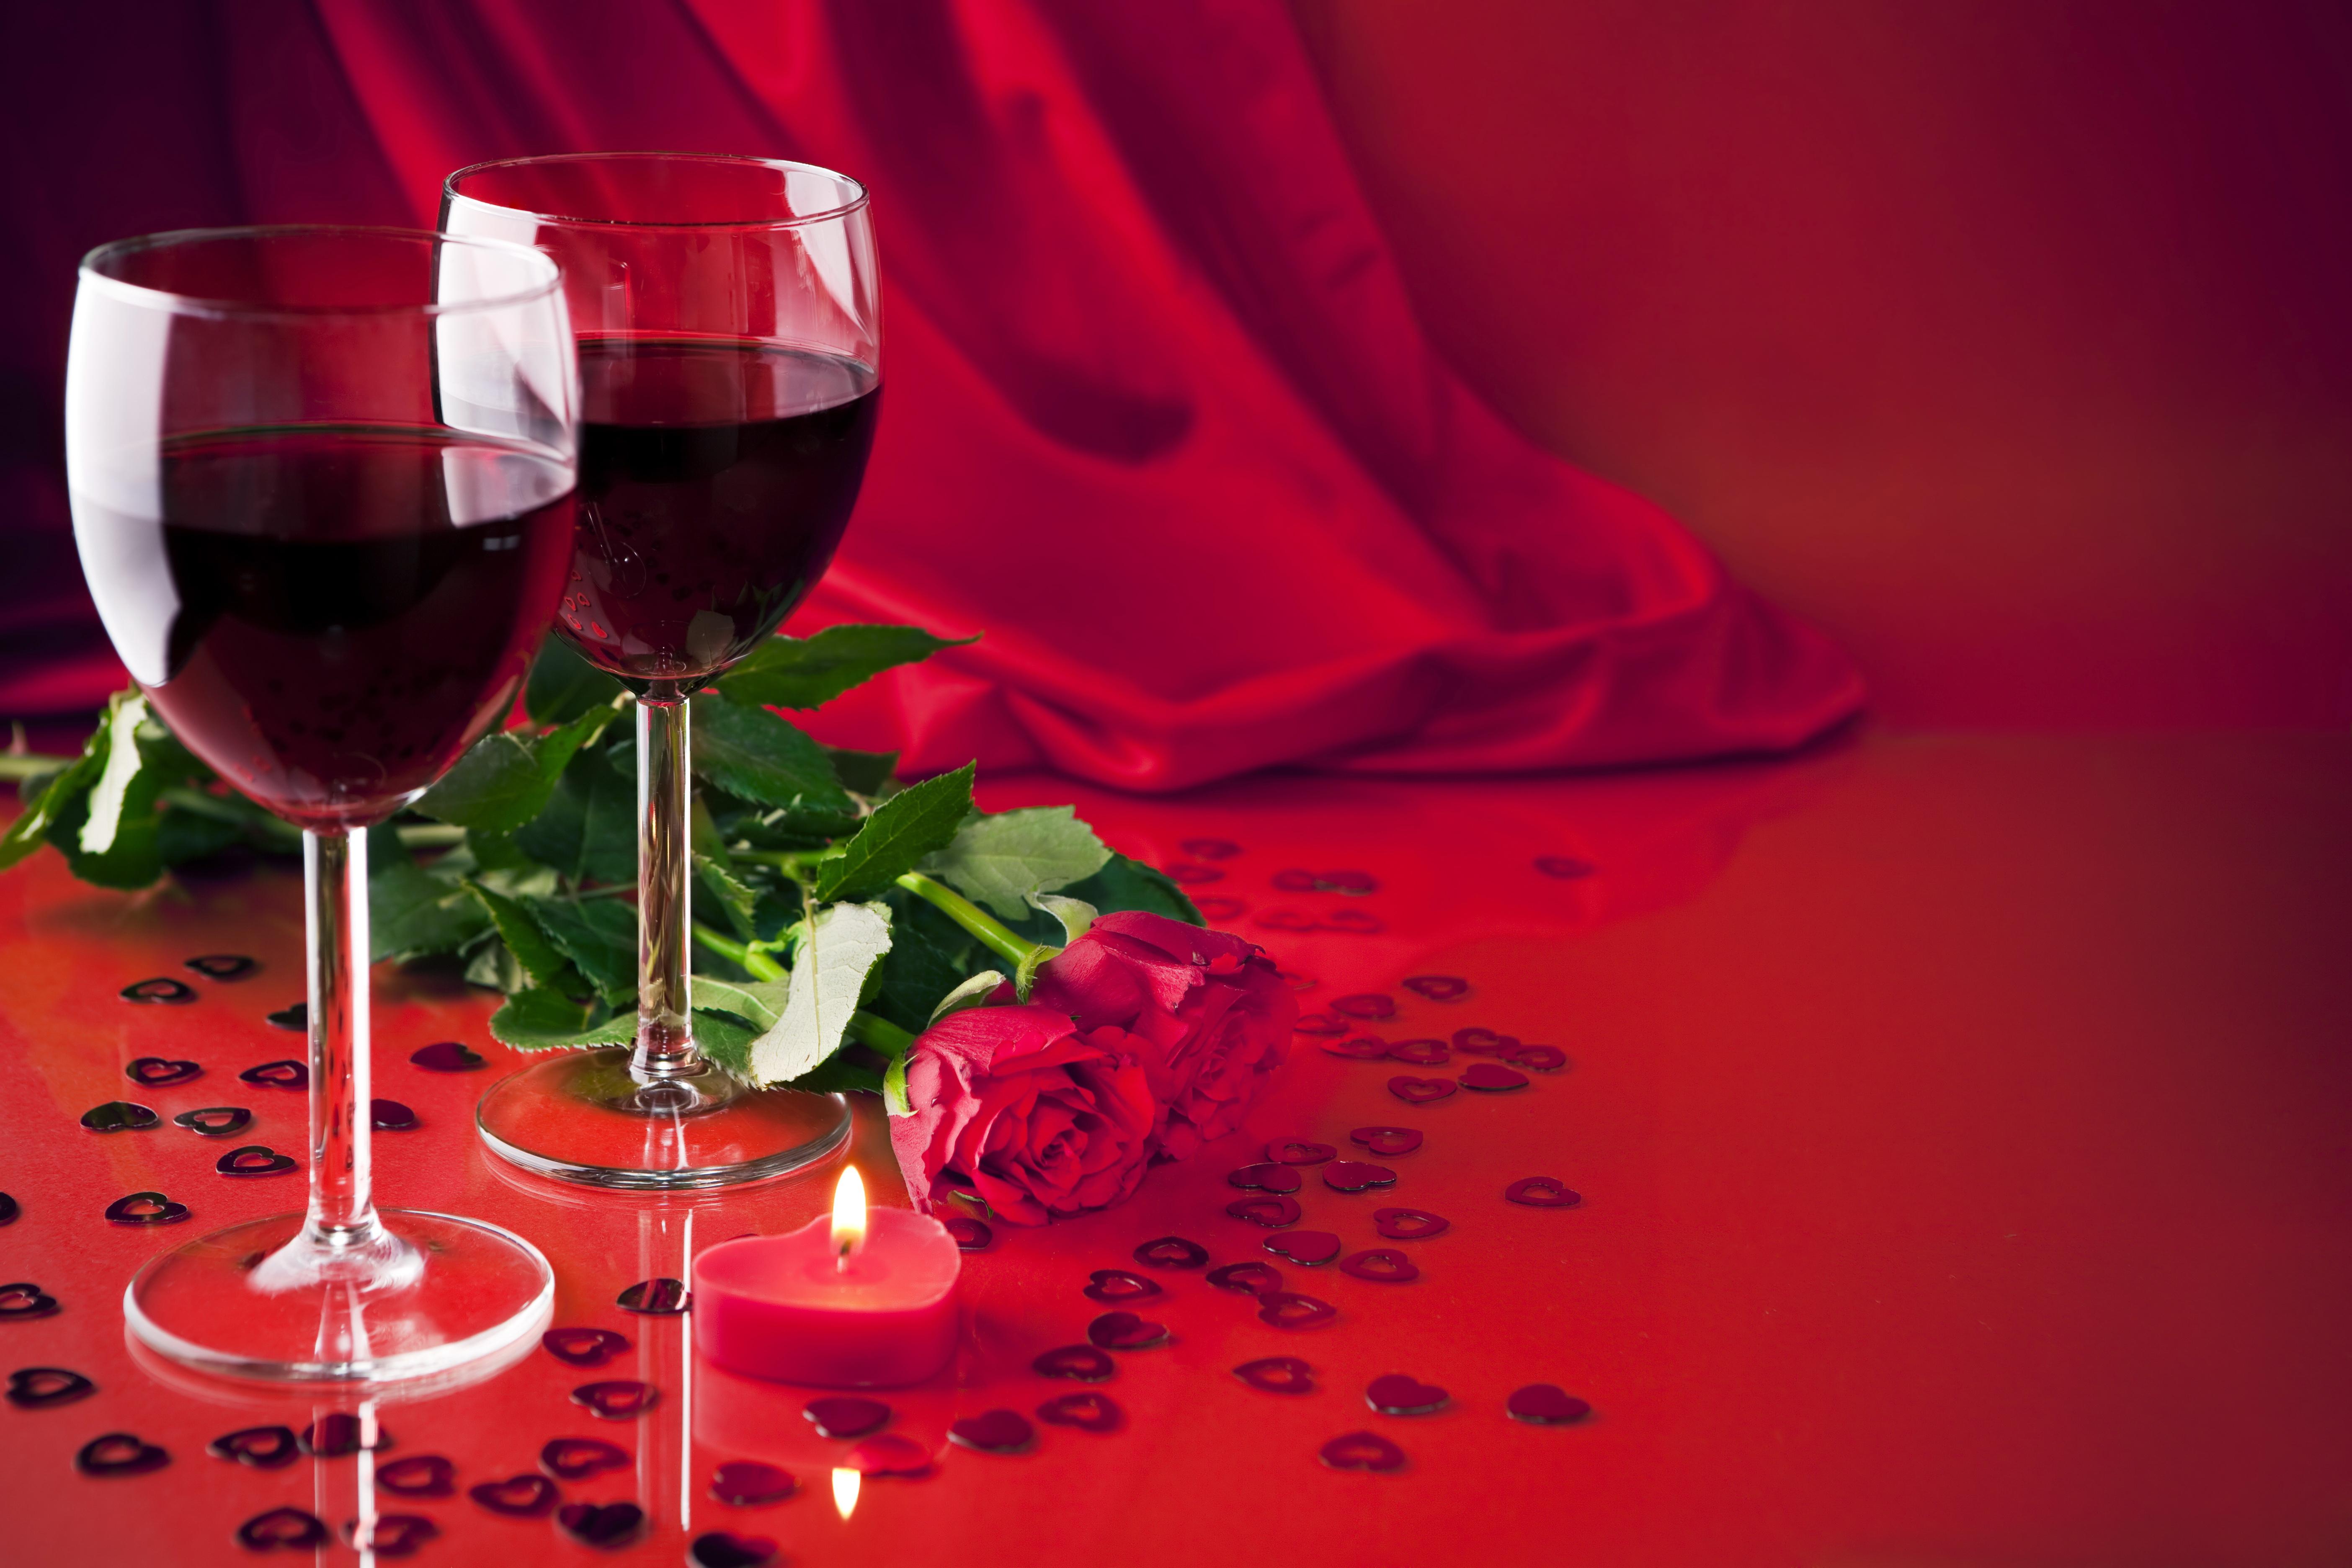 Rose wine wallpaper